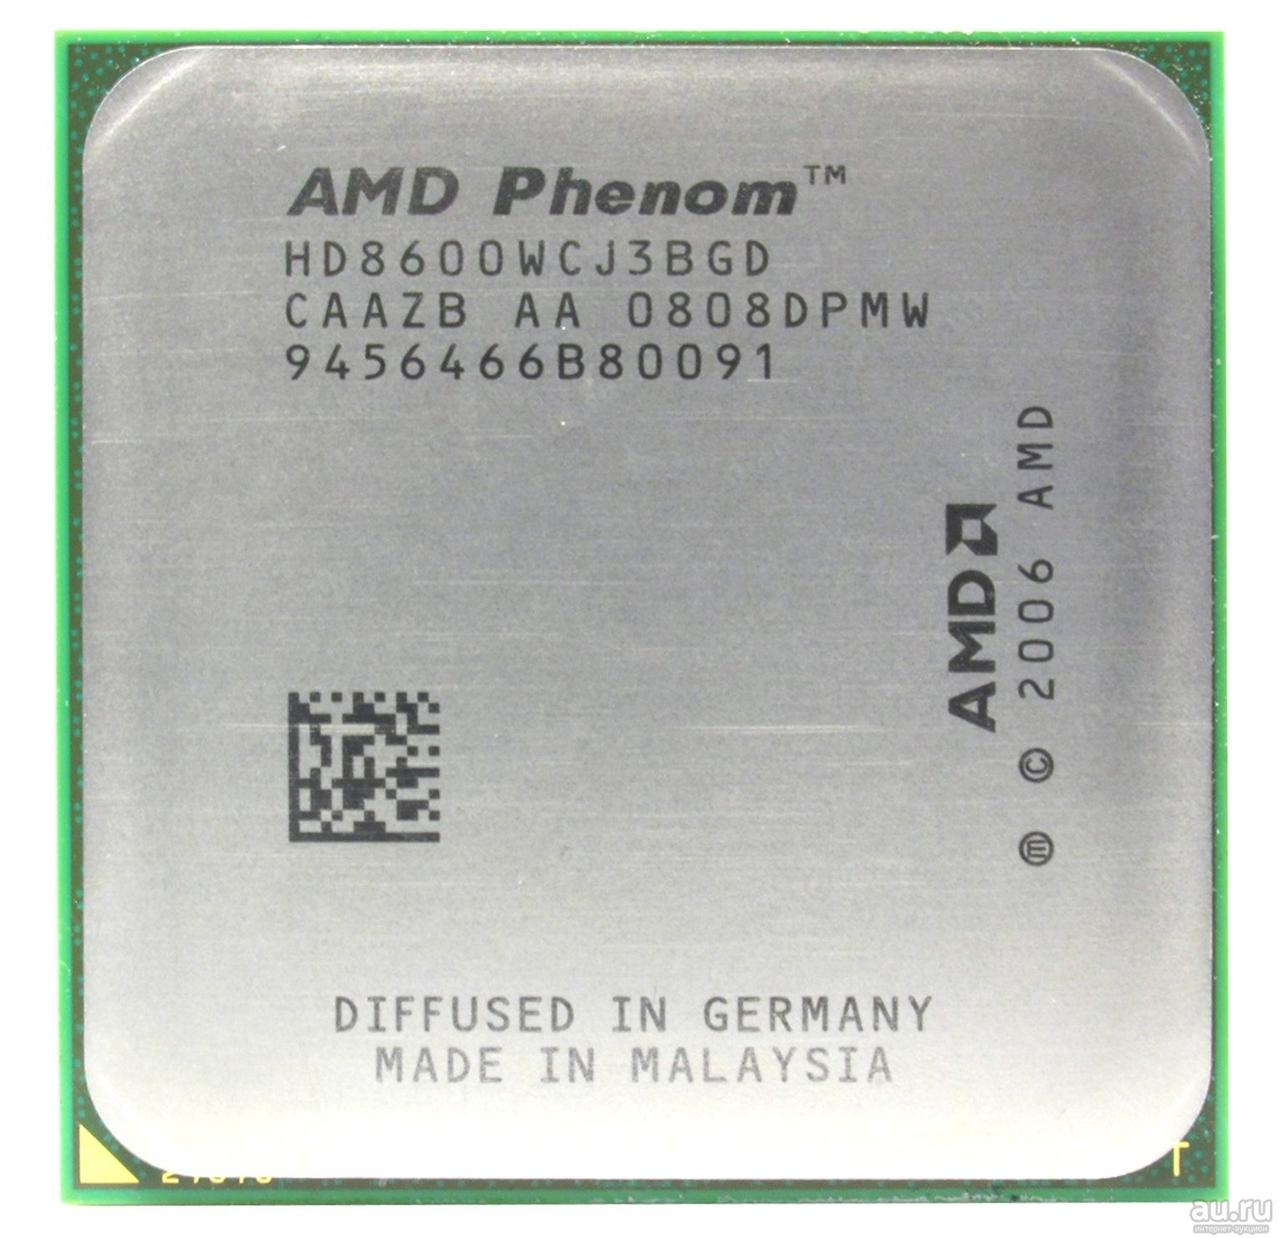 Процессор AMD Phenom X3 8600 2.30GHz/2M/1800 (HD8600WCJ3BGD) sAM2+, tray